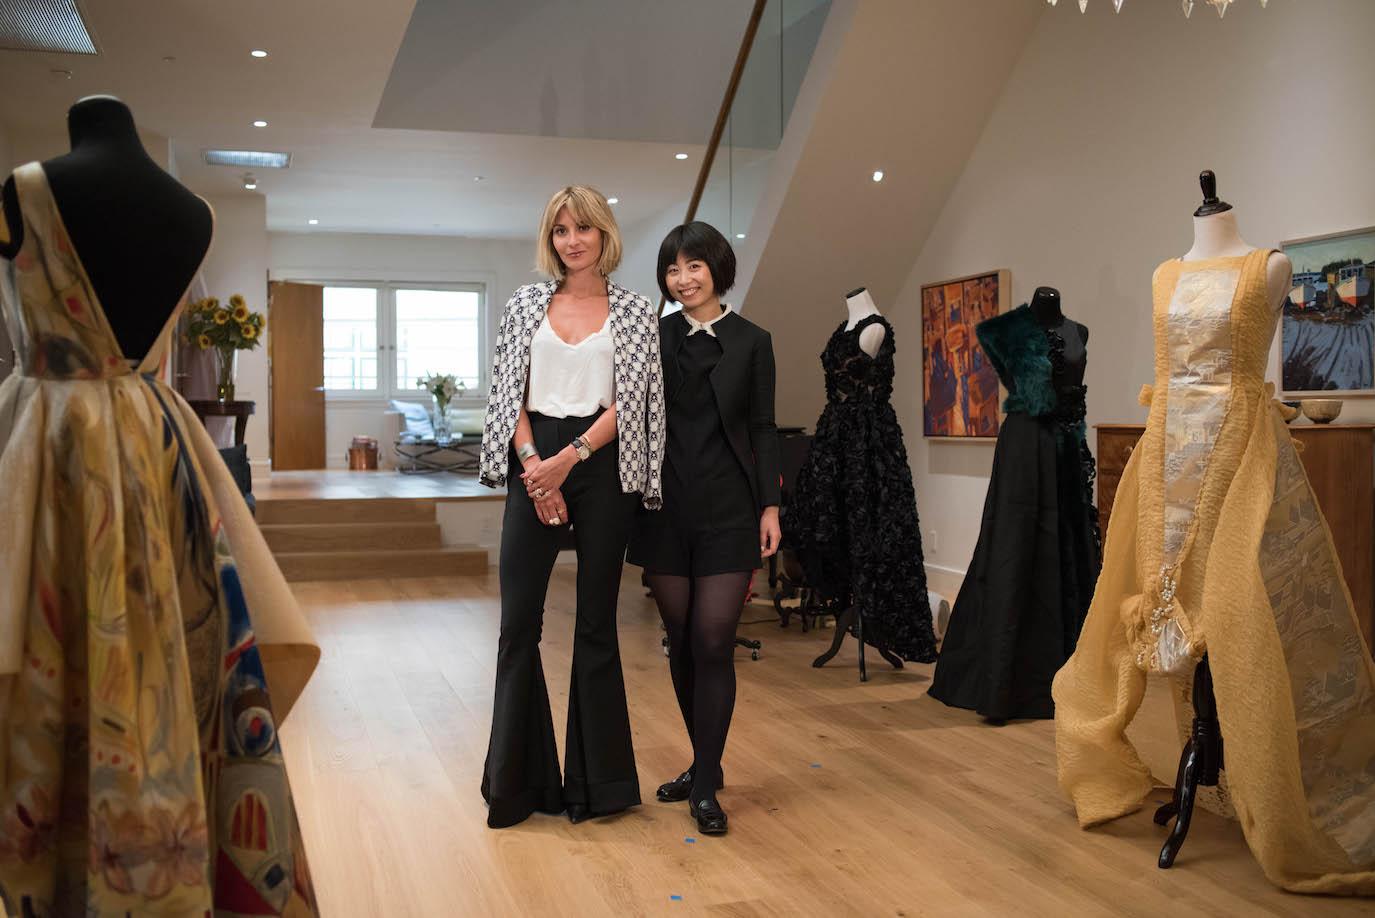 Stylist Mary Gonsalves Kinney and fashion designer Yuka Uehara